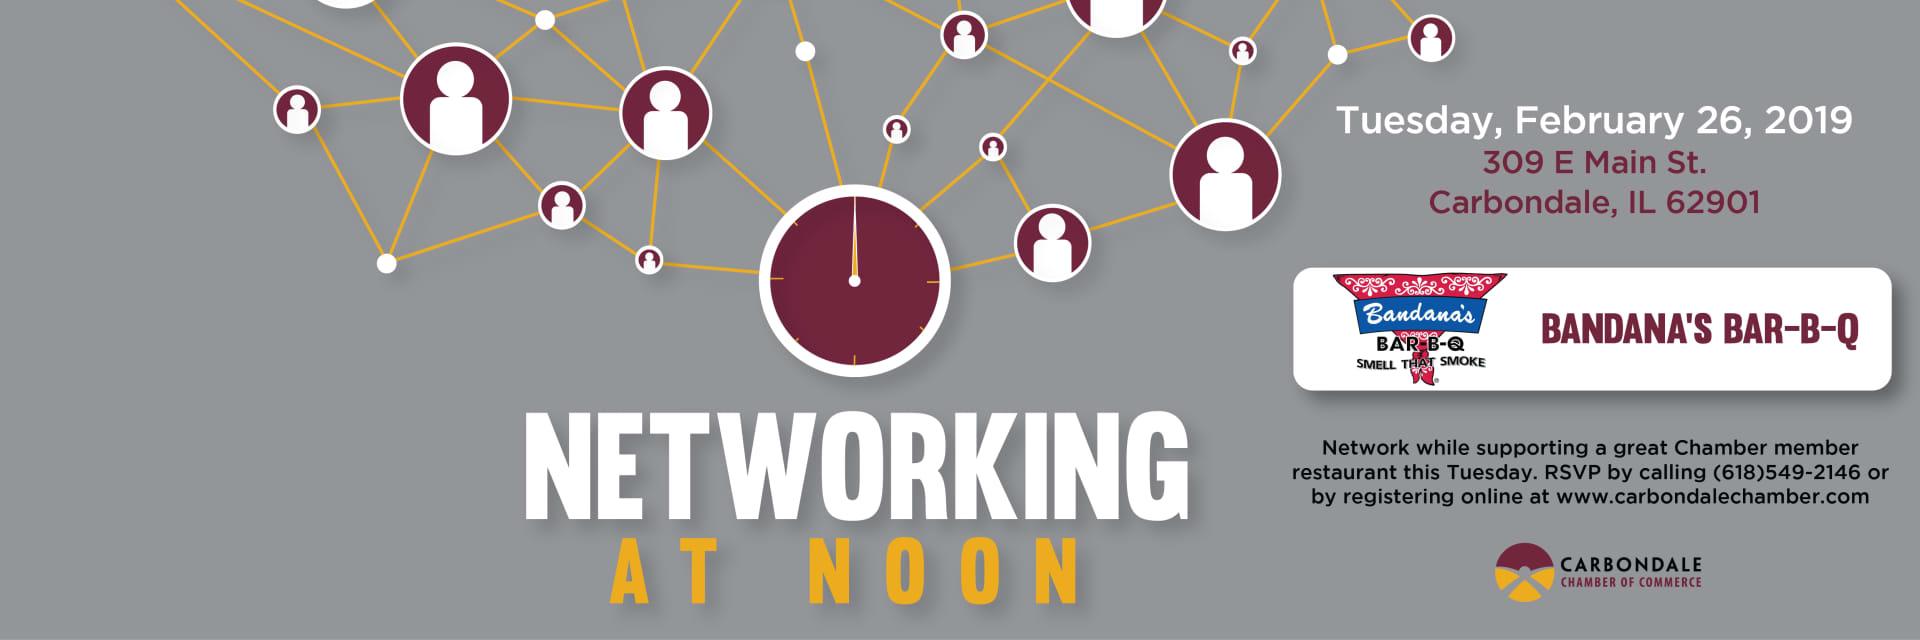 Networking-at-Noon_Feb_Slider-01-w1920.jpg